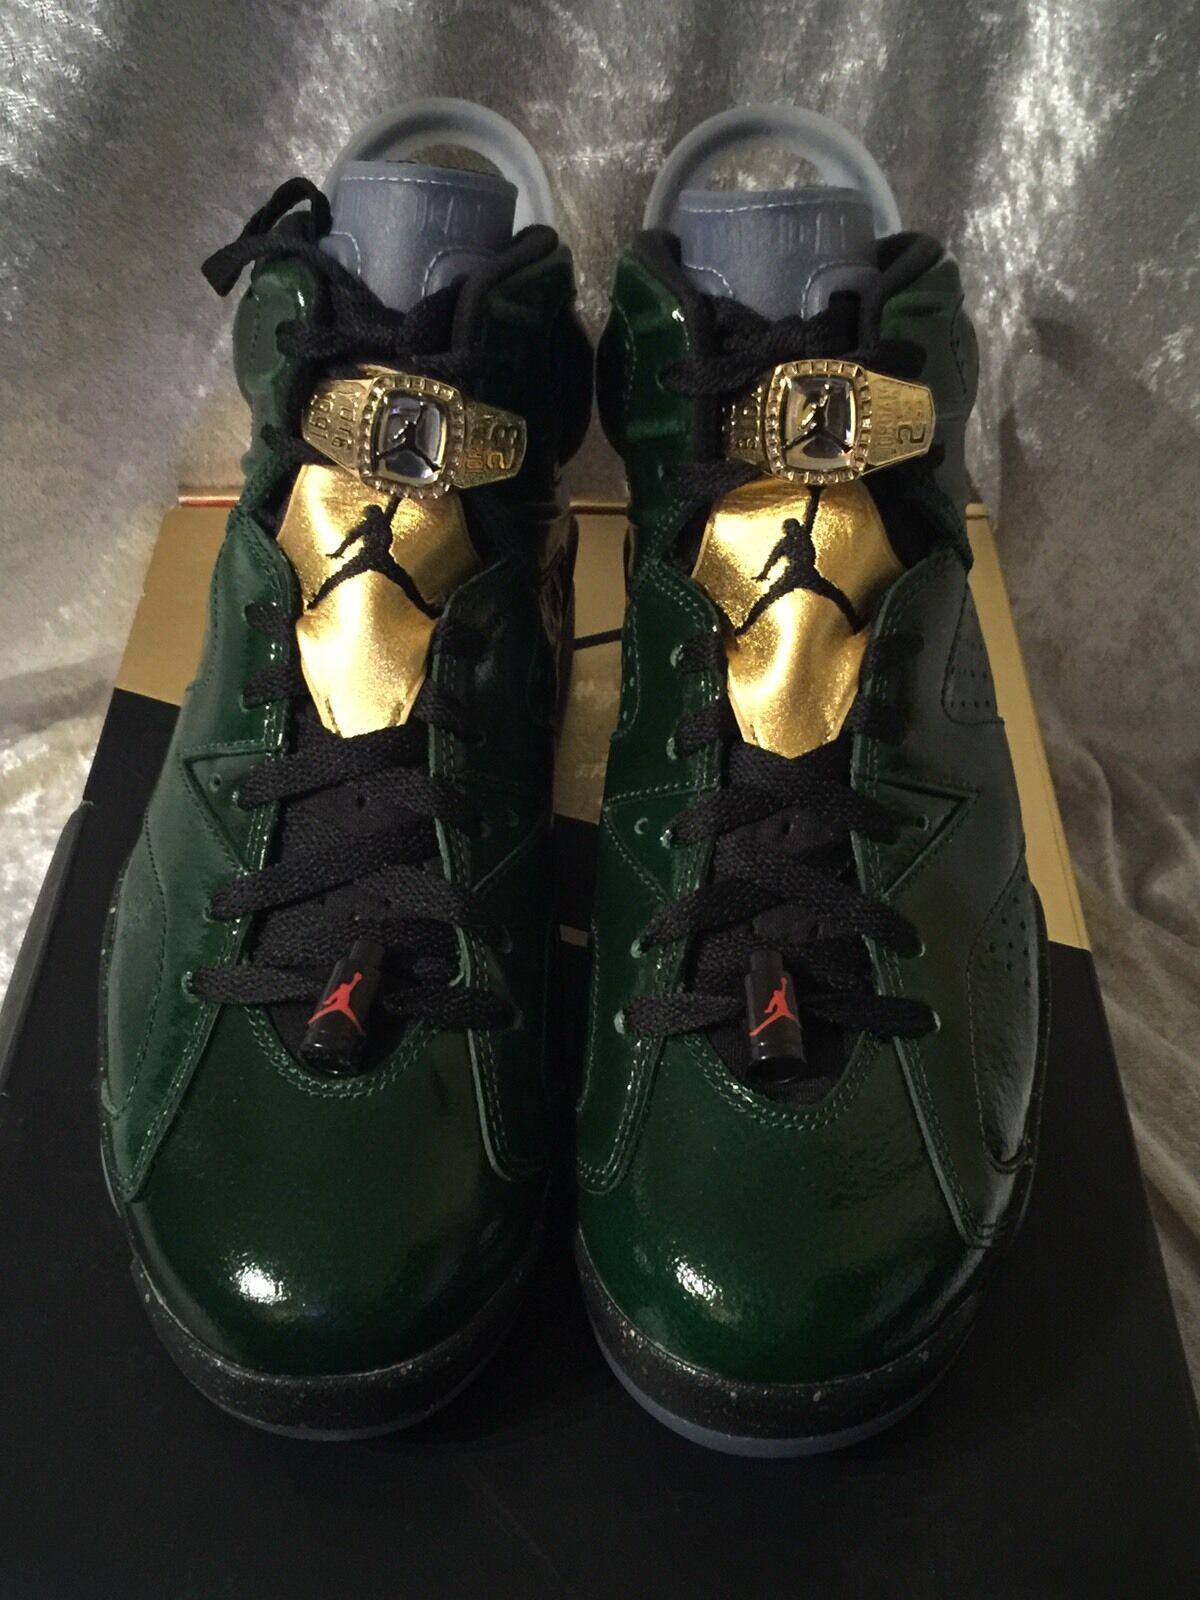 Nike jordan 6 retrò champagne dimensioni